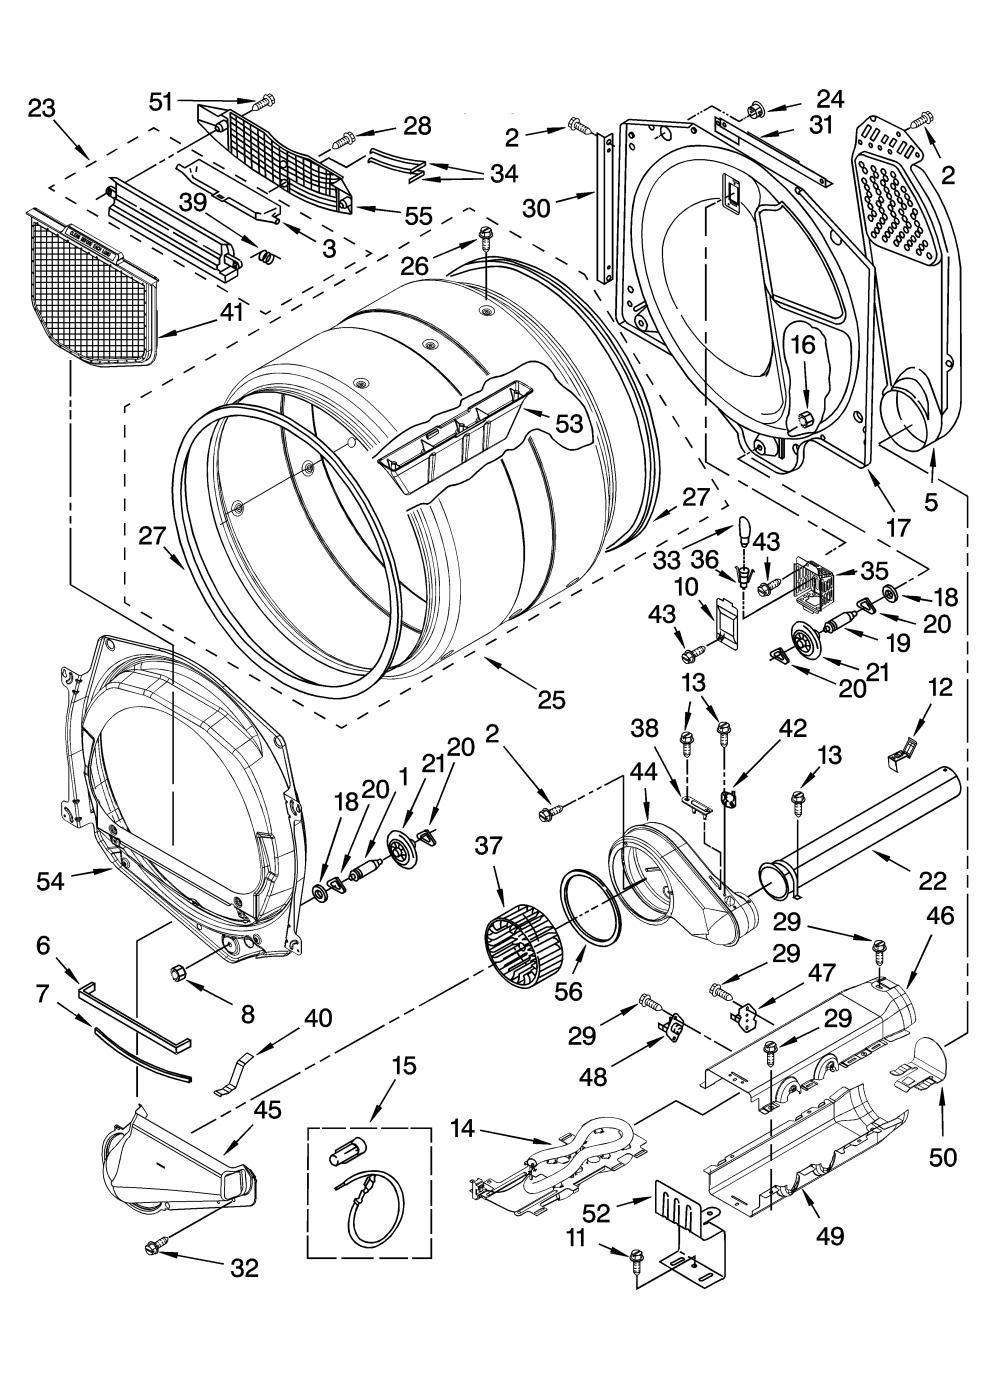 medium resolution of dryer wiring diagram likewise whirlpool duet dryer parts diagram on